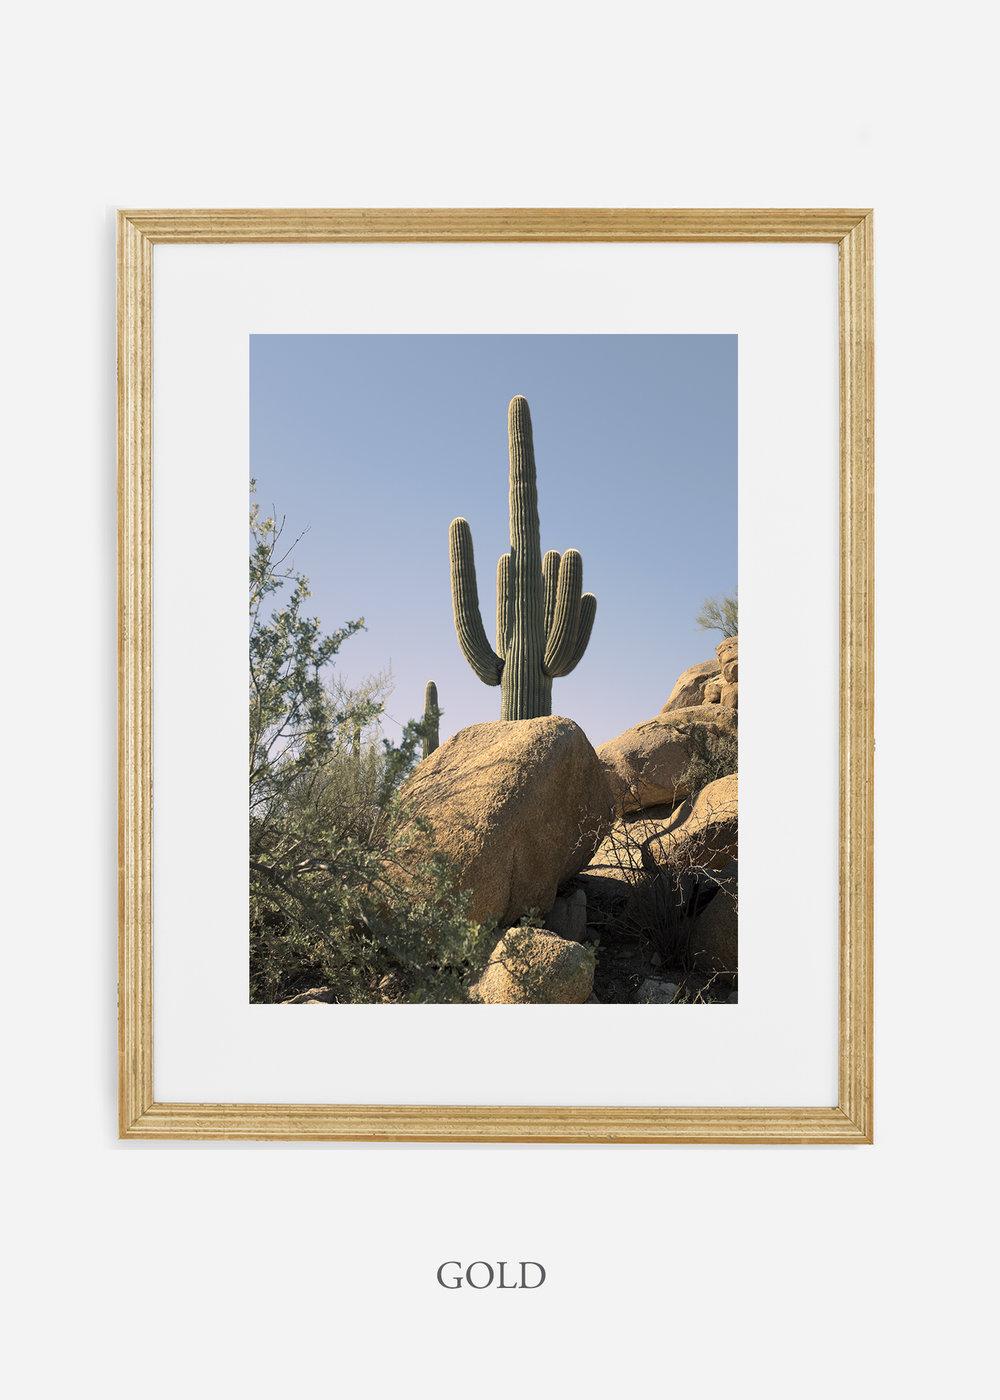 goldframe-saguaroNo.14-wildercalifornia-art-wallart-cactusprint-homedecor-prints-arizona-botanical-artwork-interiordesign.jpg